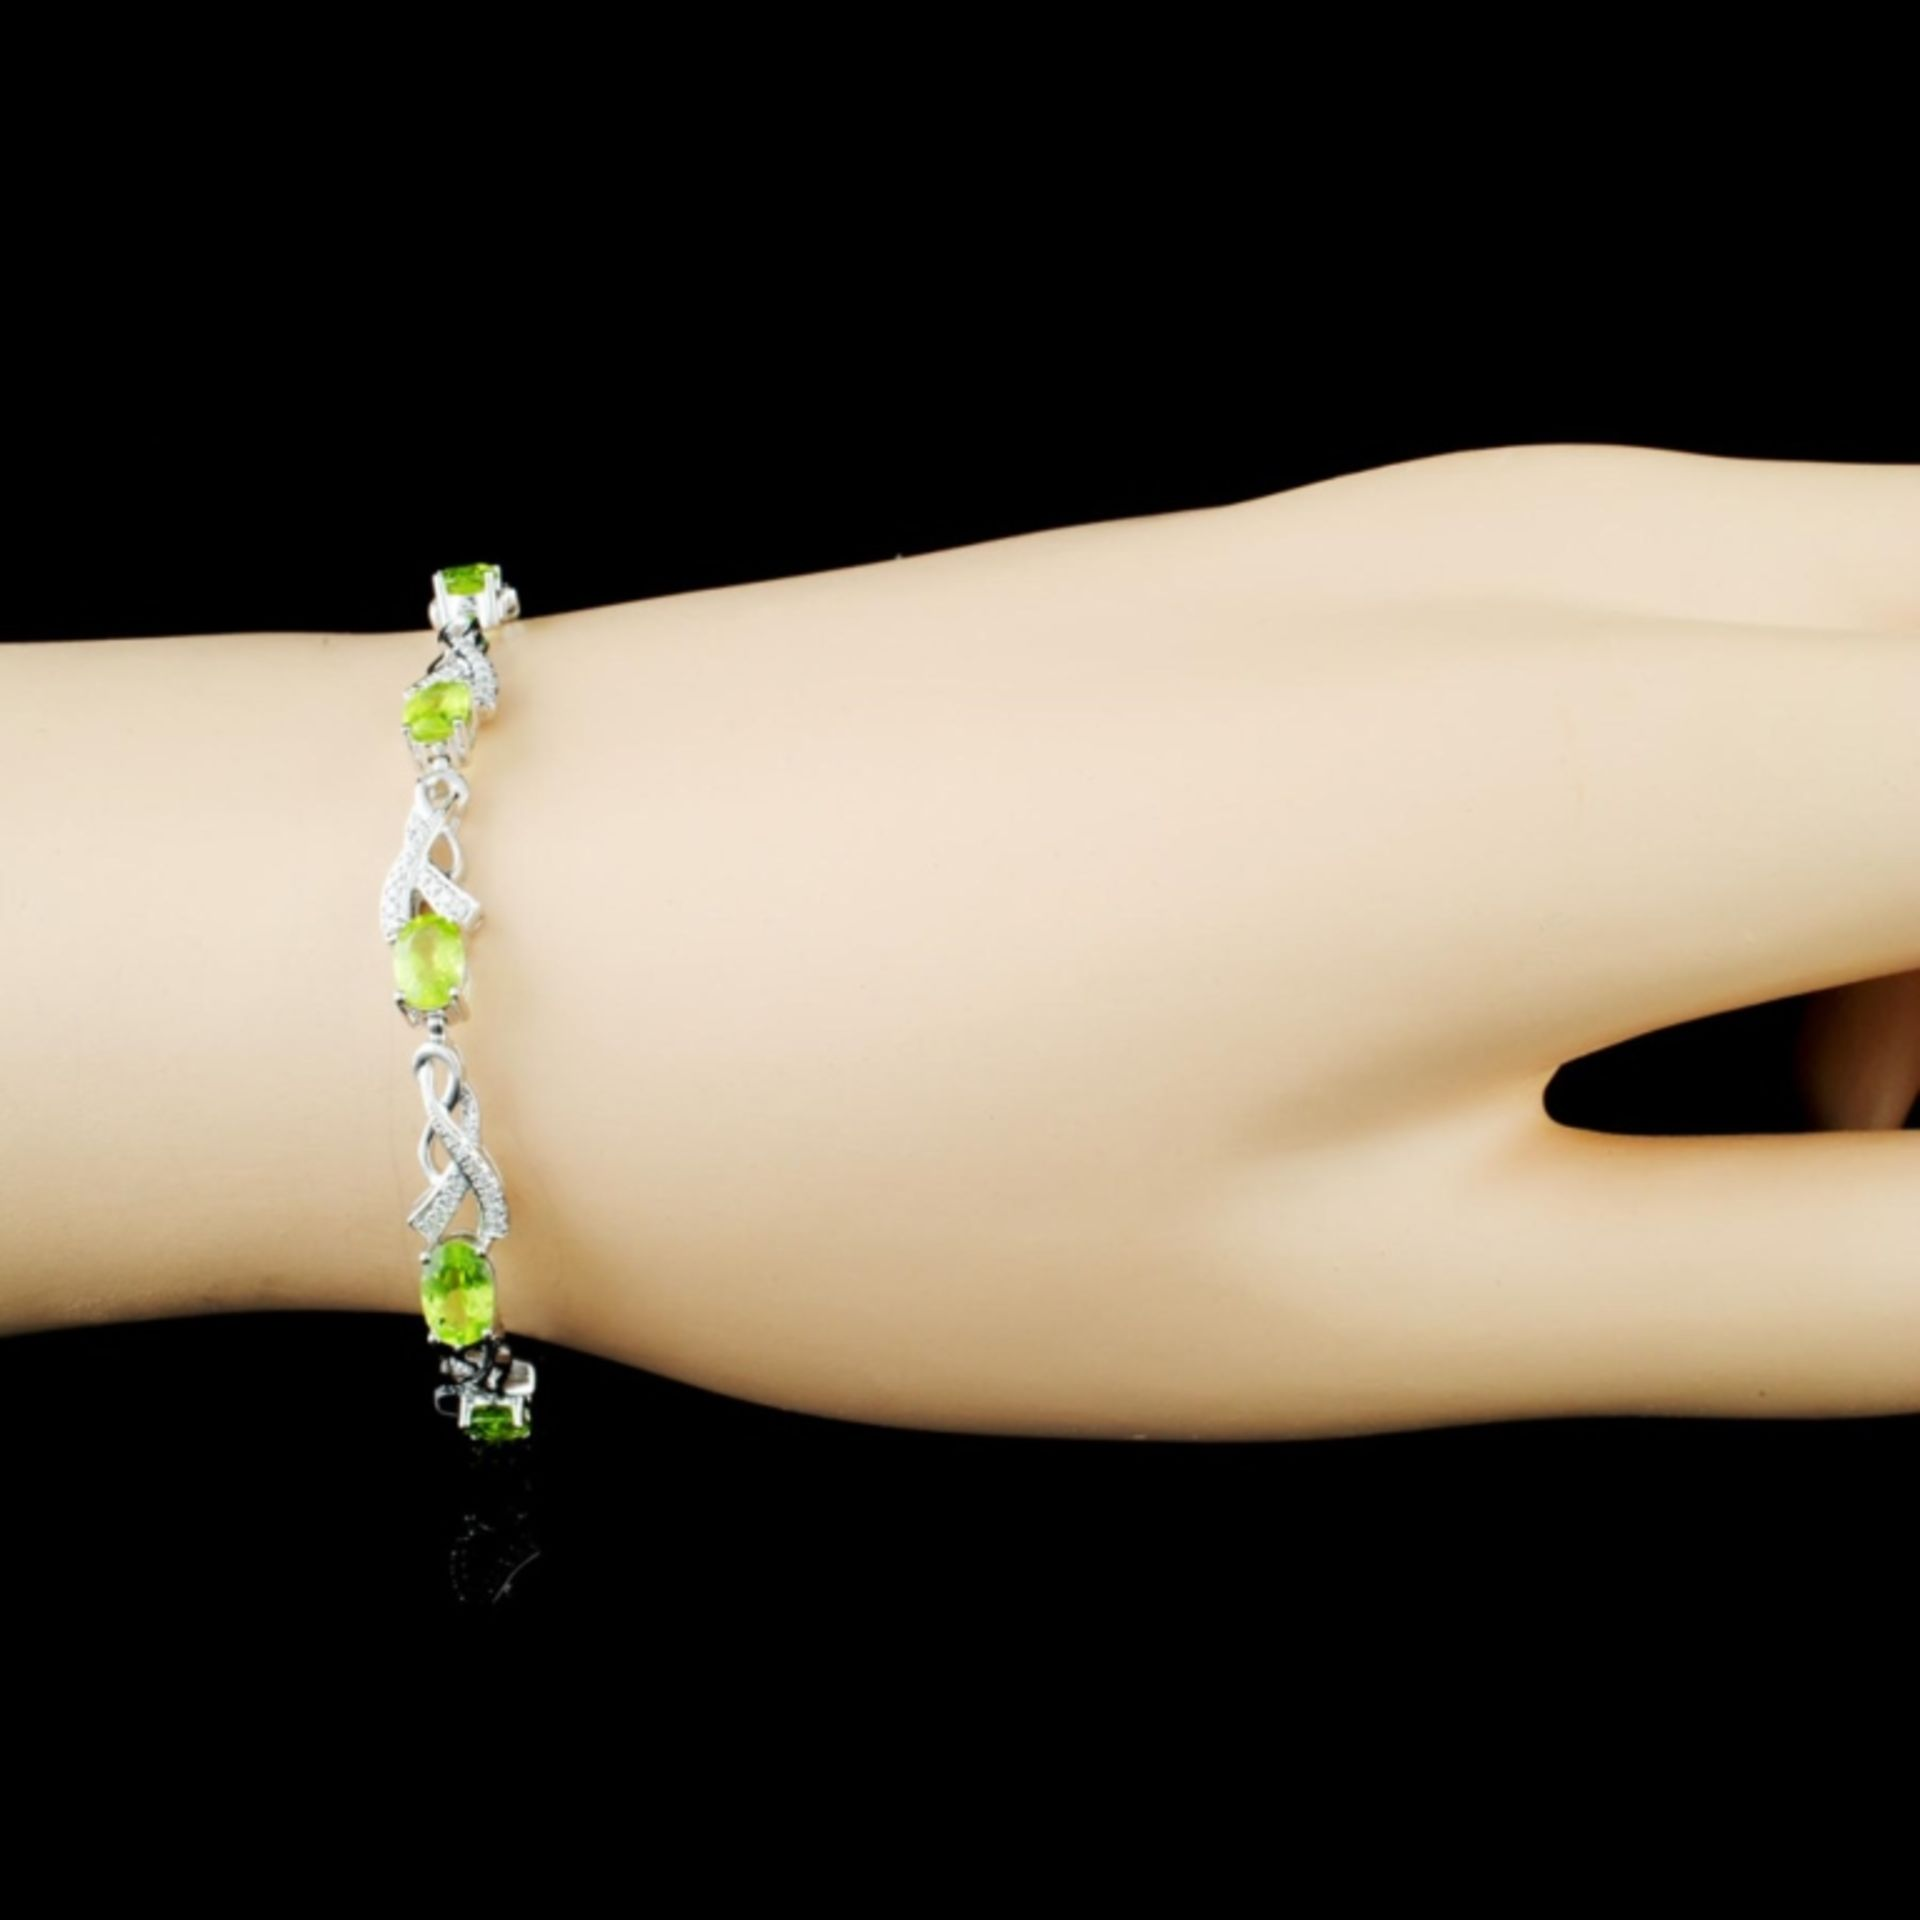 14K Gold 4.60ct Peridot & 0.31ctw Diamond Bracelet - Image 3 of 4